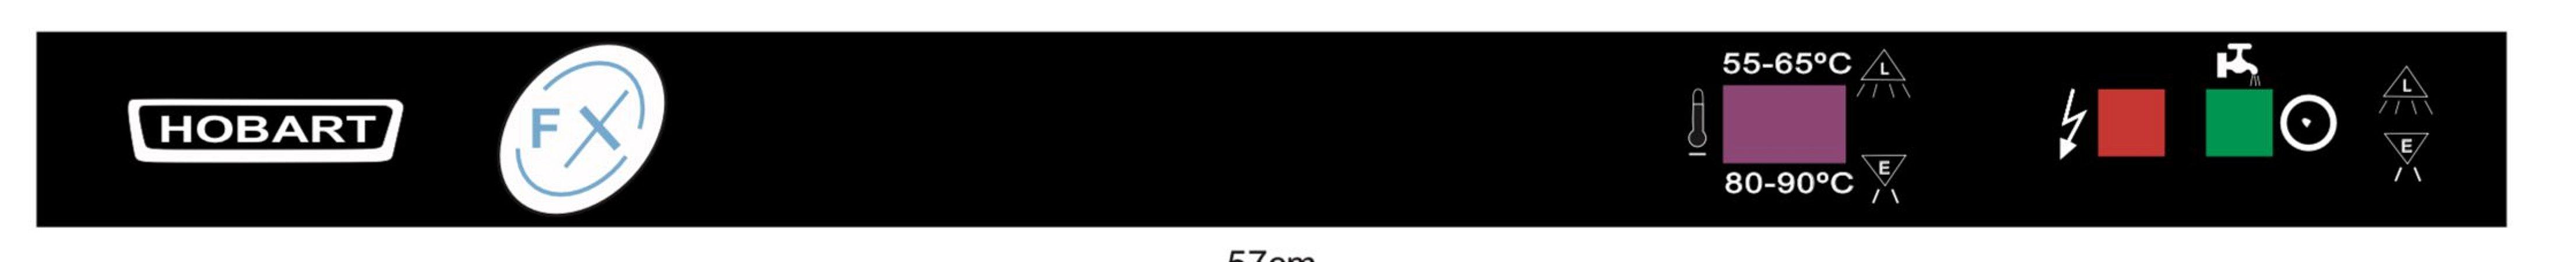 Adesivo Membrana Etiqueta do Painel Lava Louças Hobart FX 40